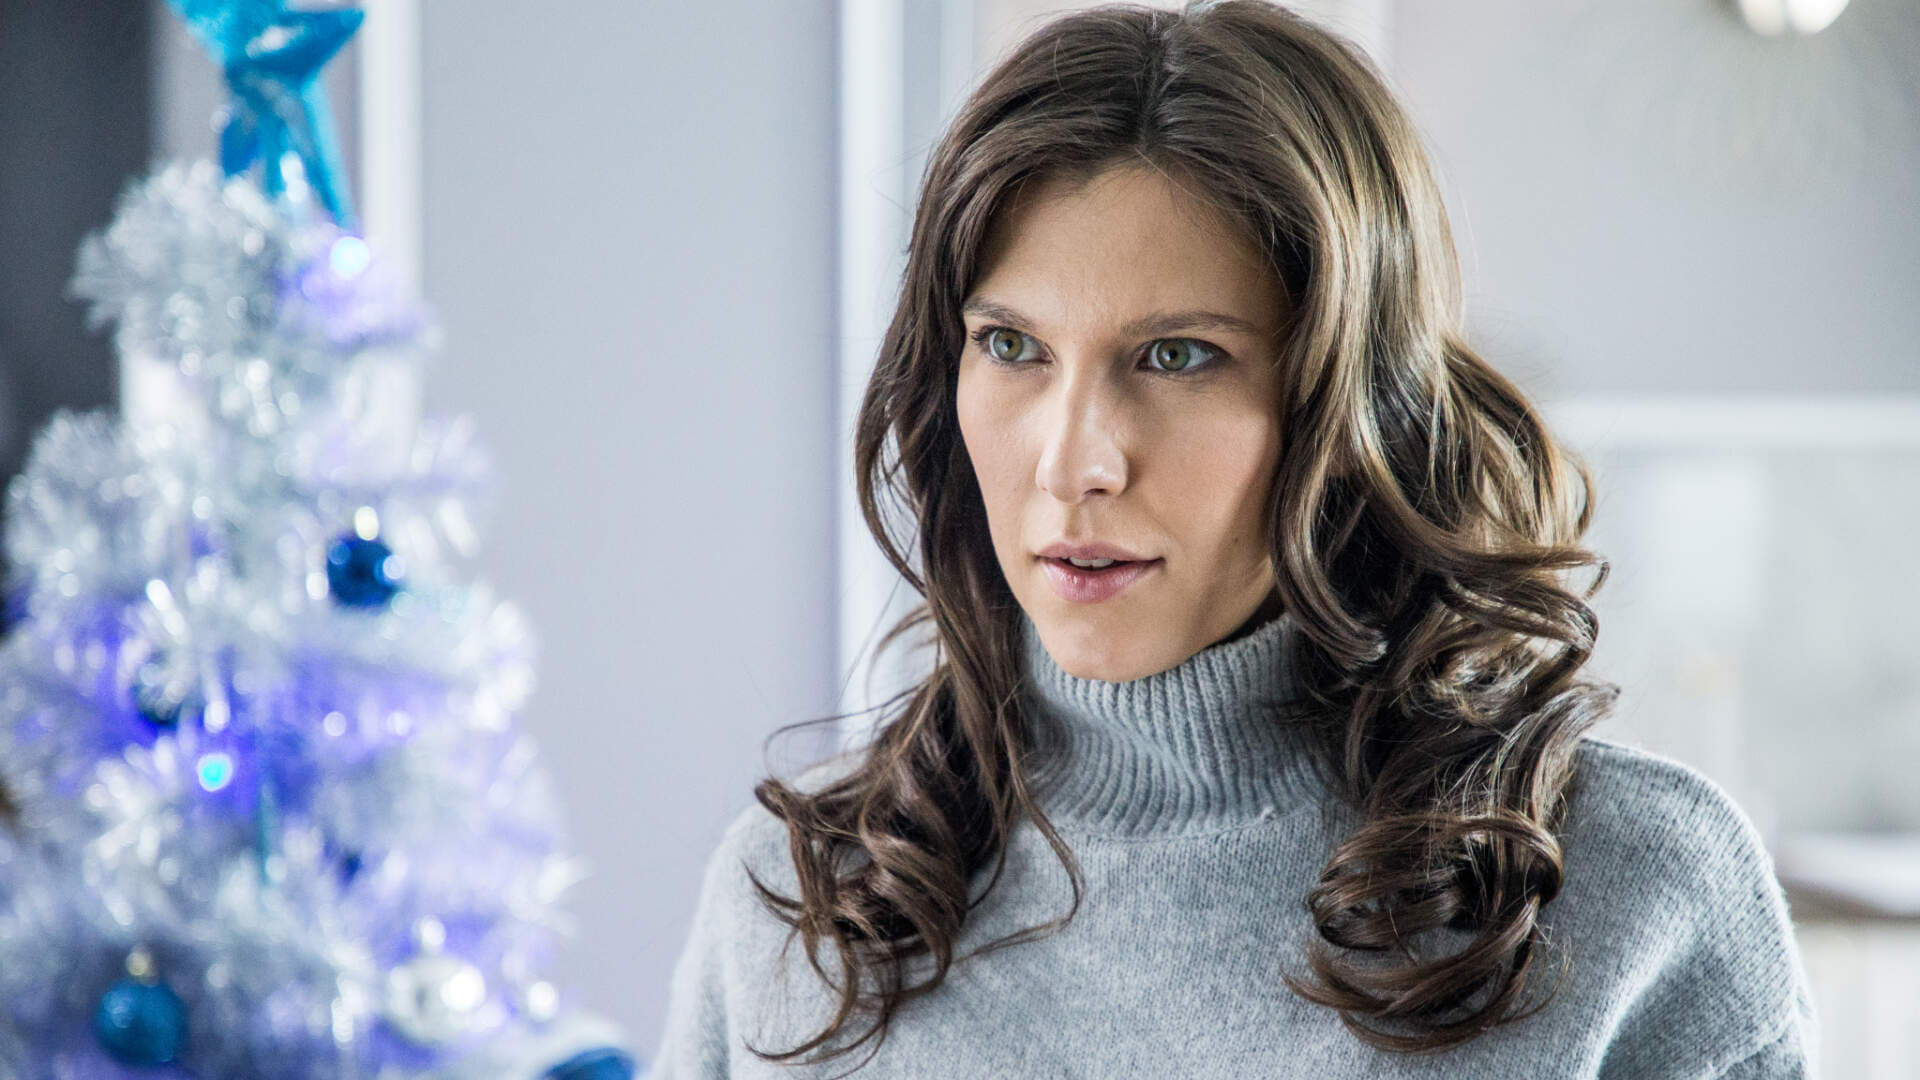 Zakochani po uszy - Season 5 Episode 37 : Episode 37